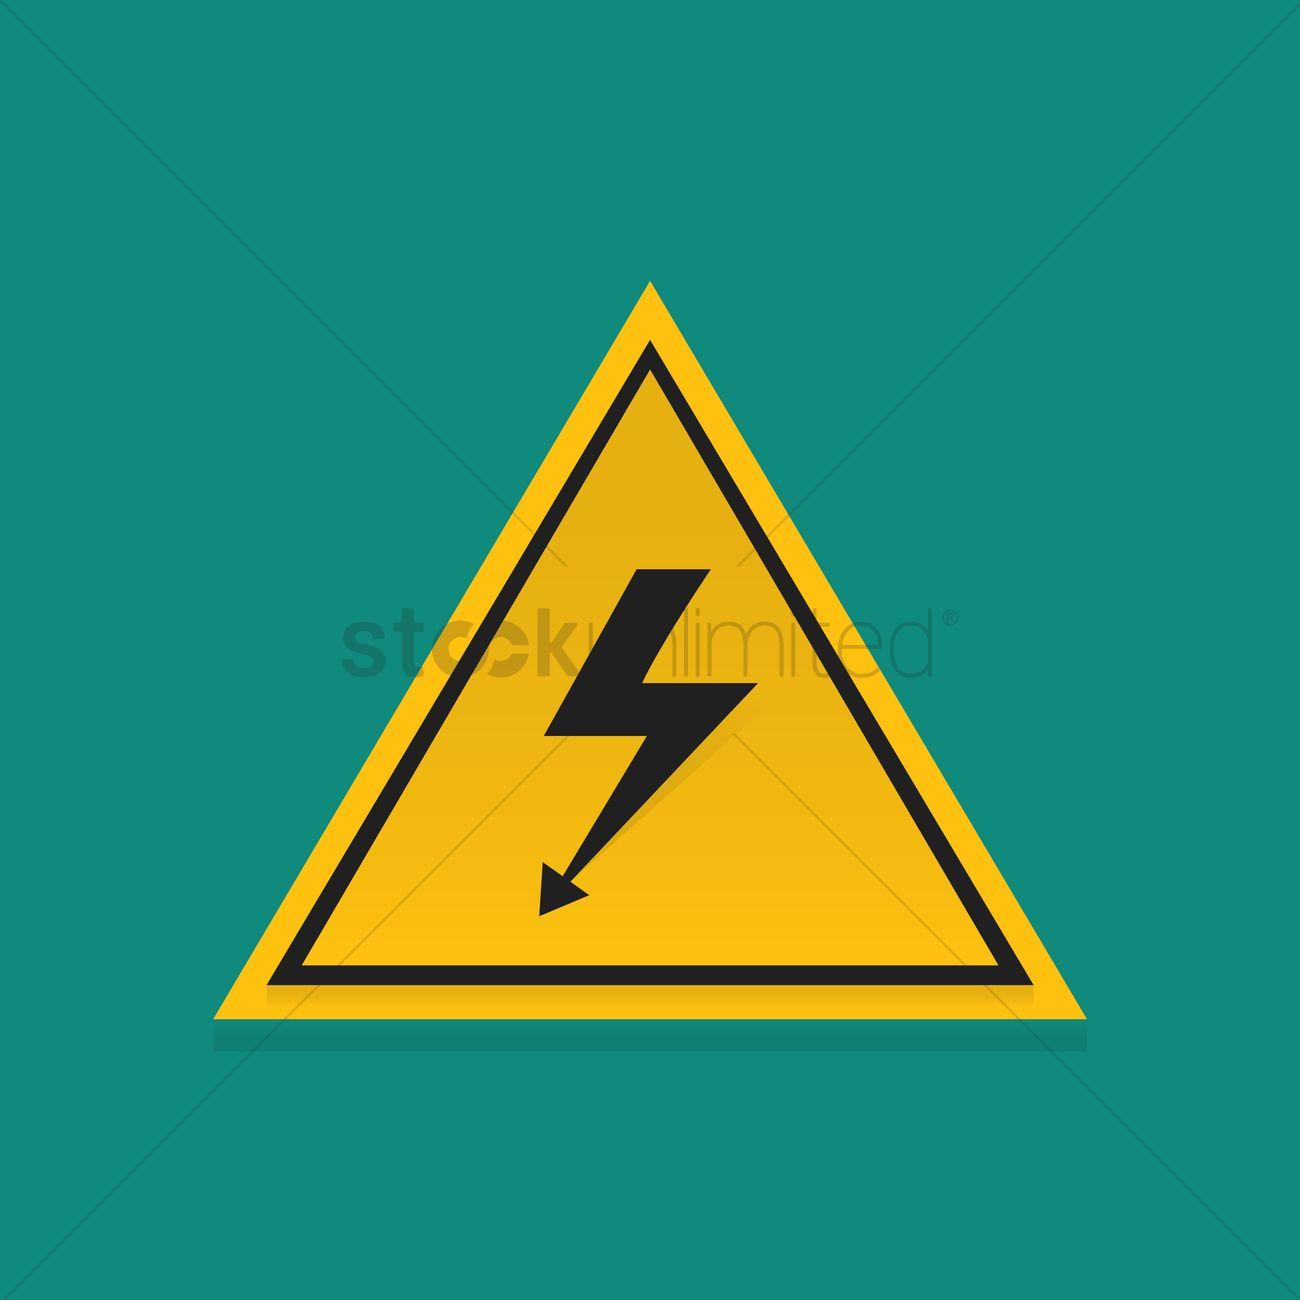 High Voltage Symbol Vector Image 1347651 Stockunlimited